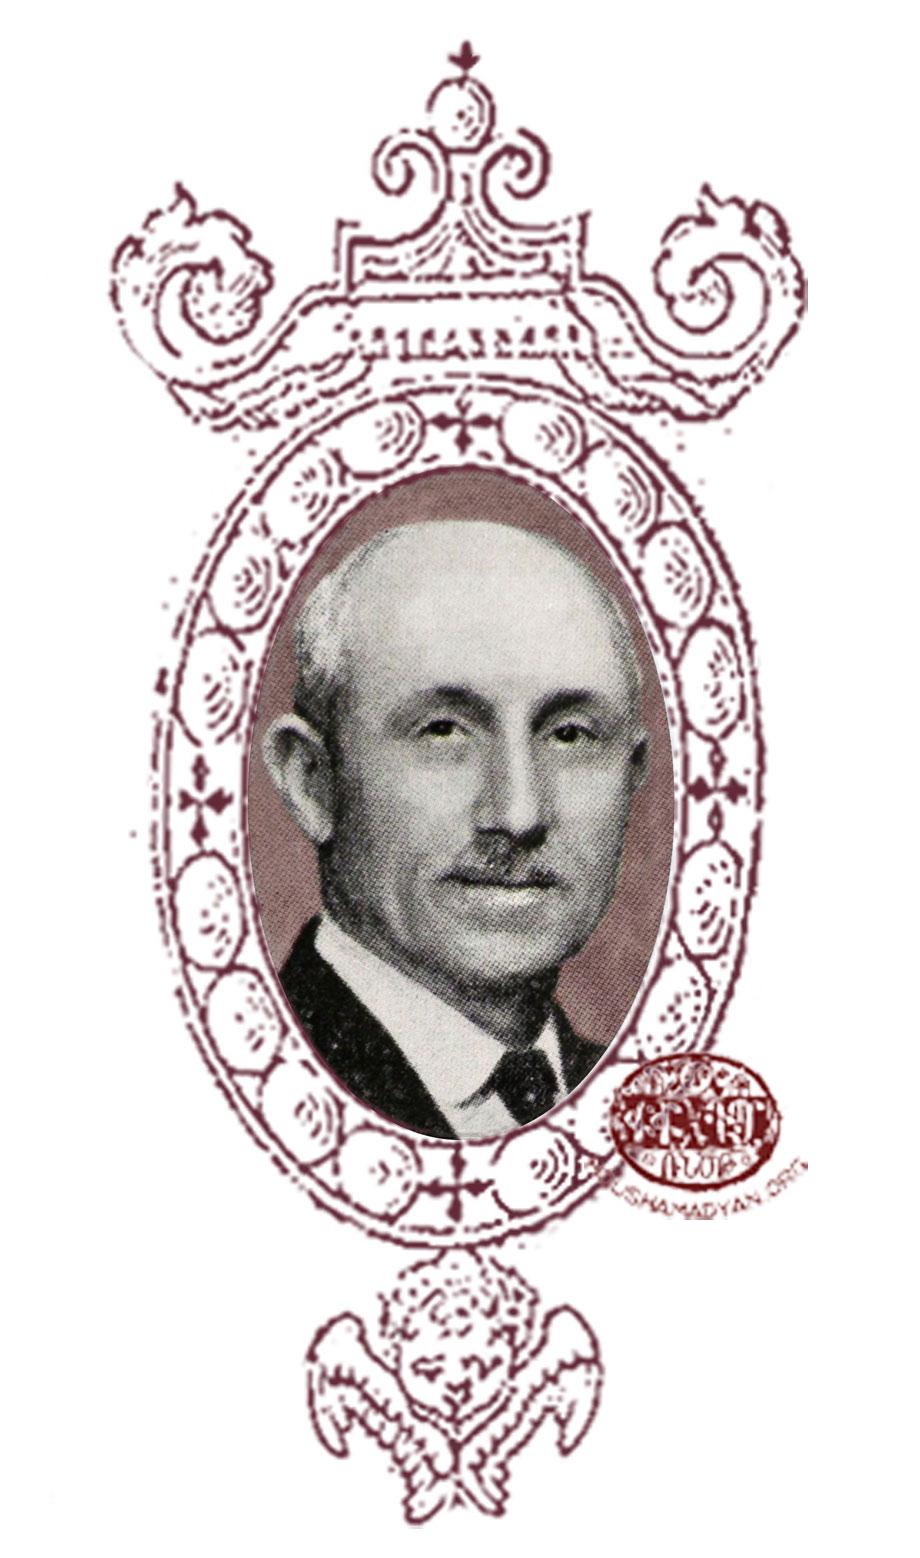 Vartan Amirkhanian